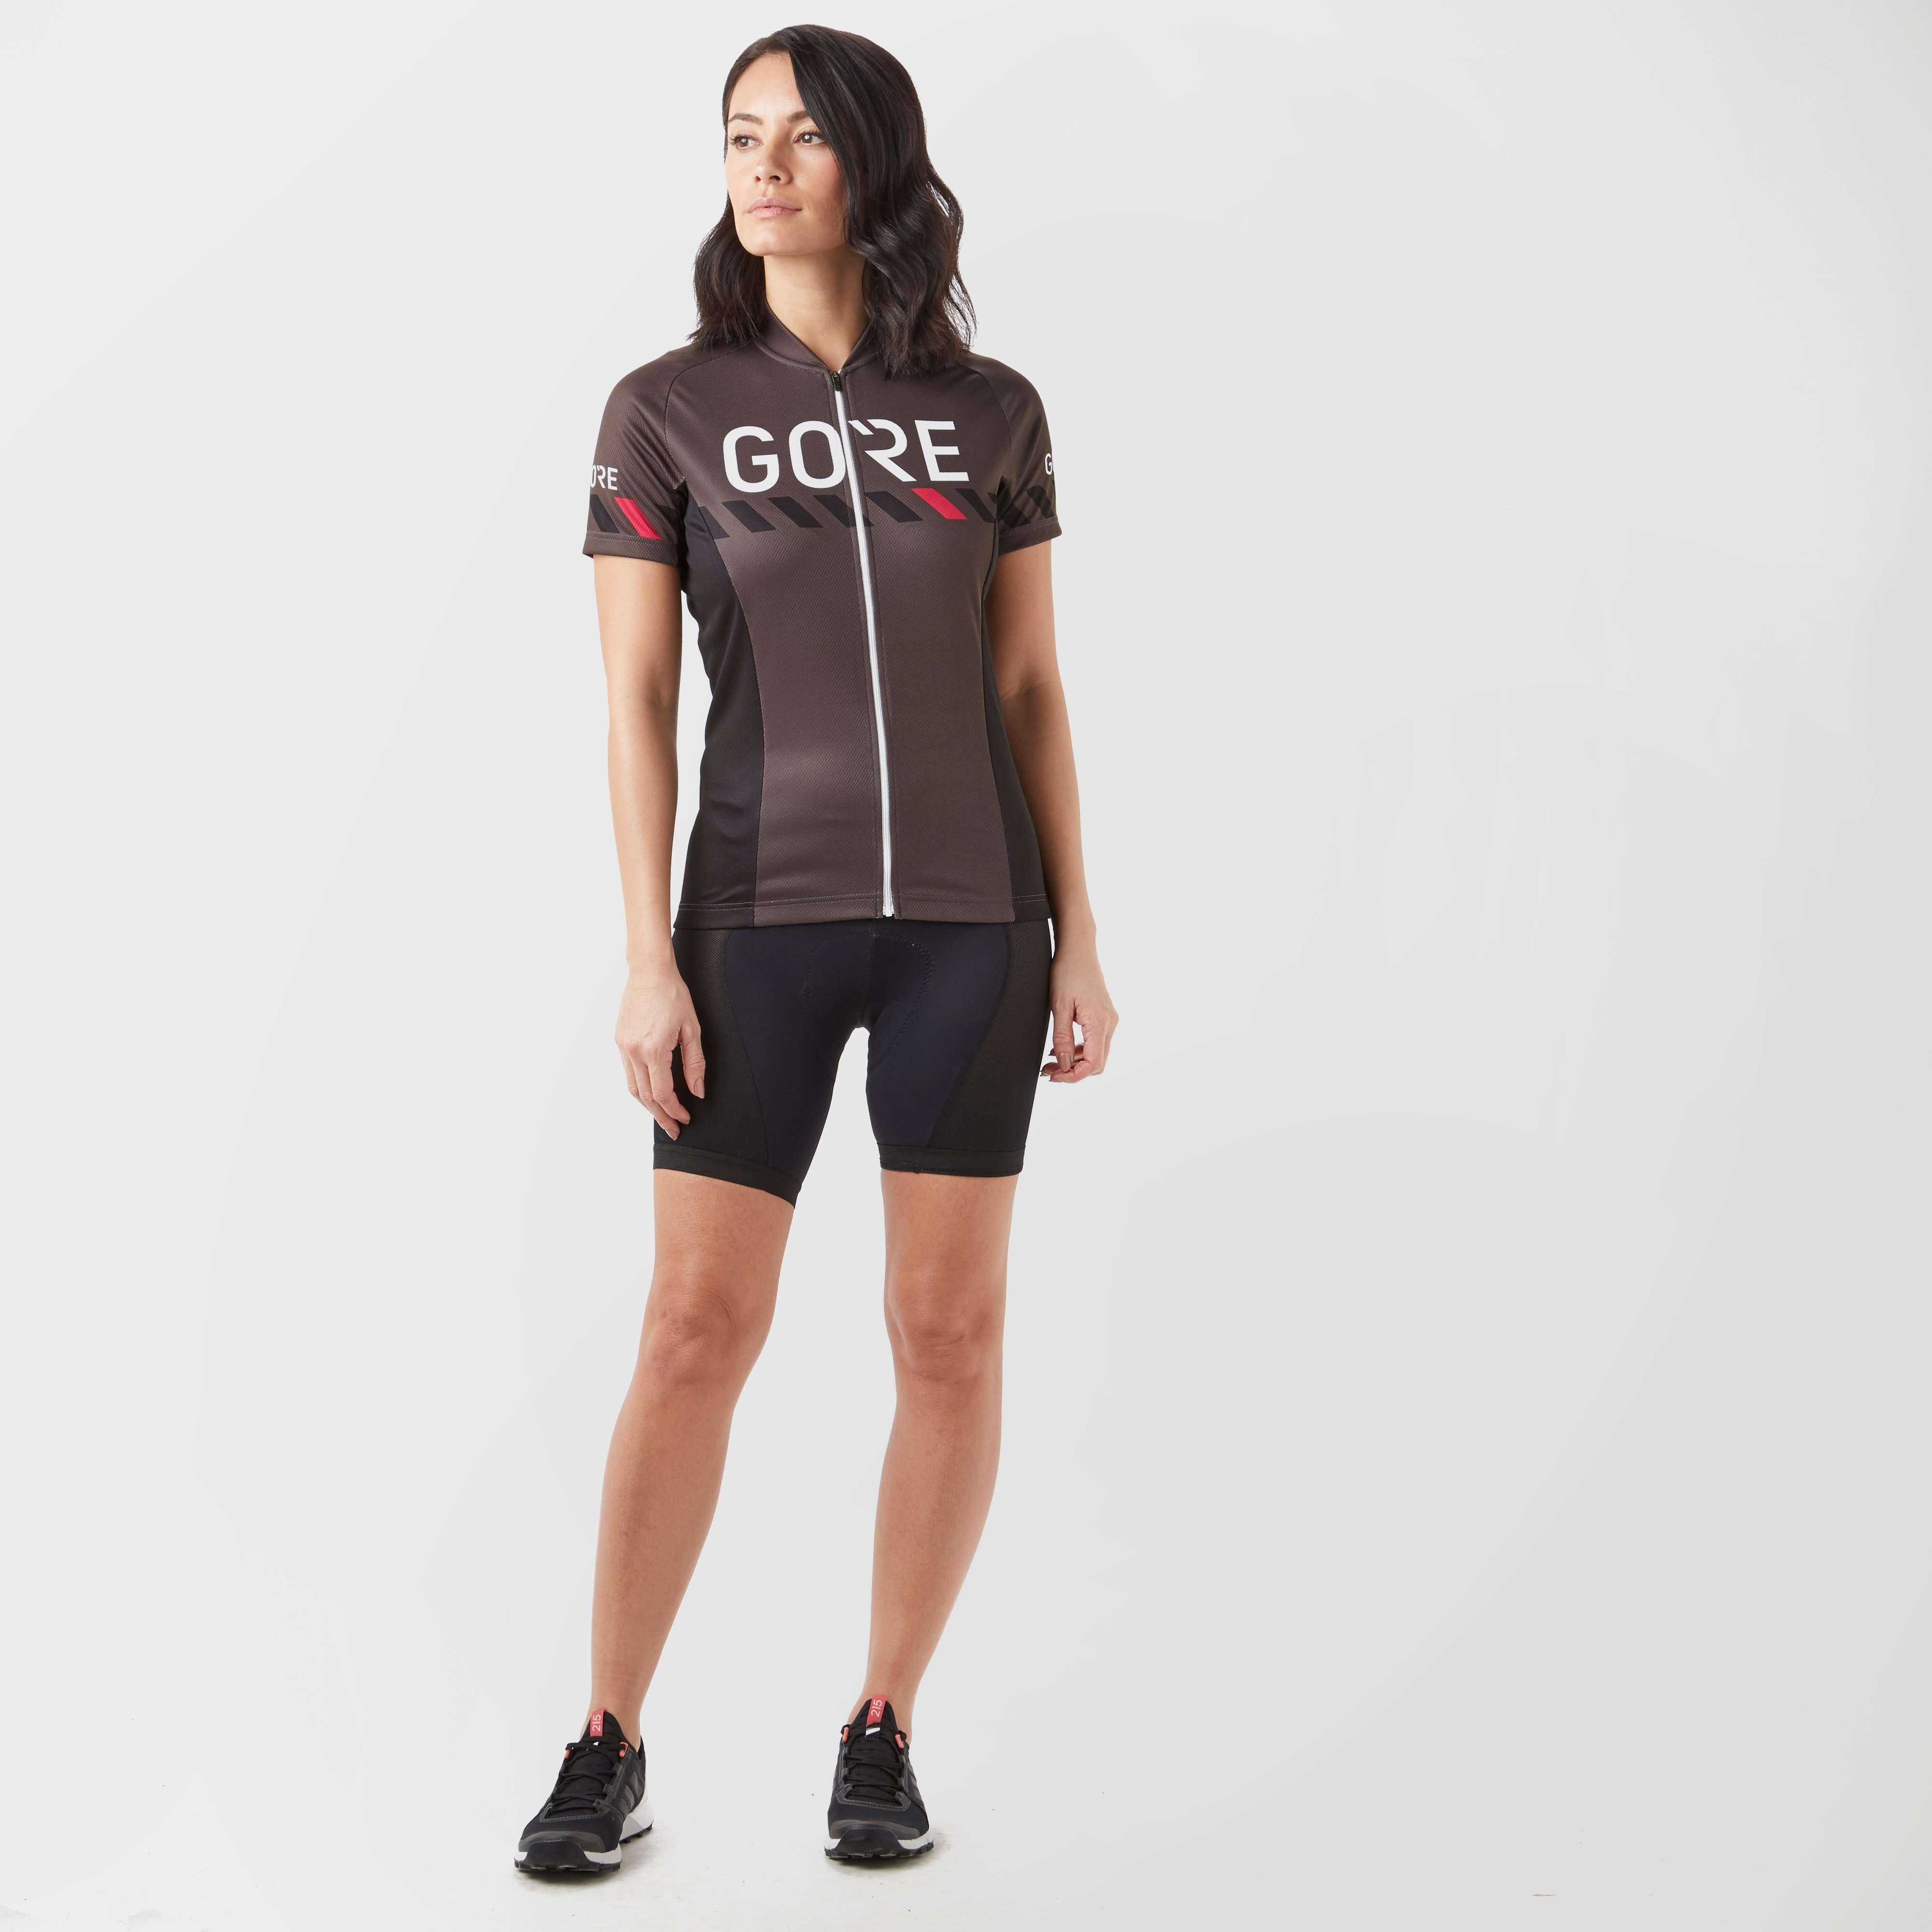 GORE Women's C3 Brand Jersey